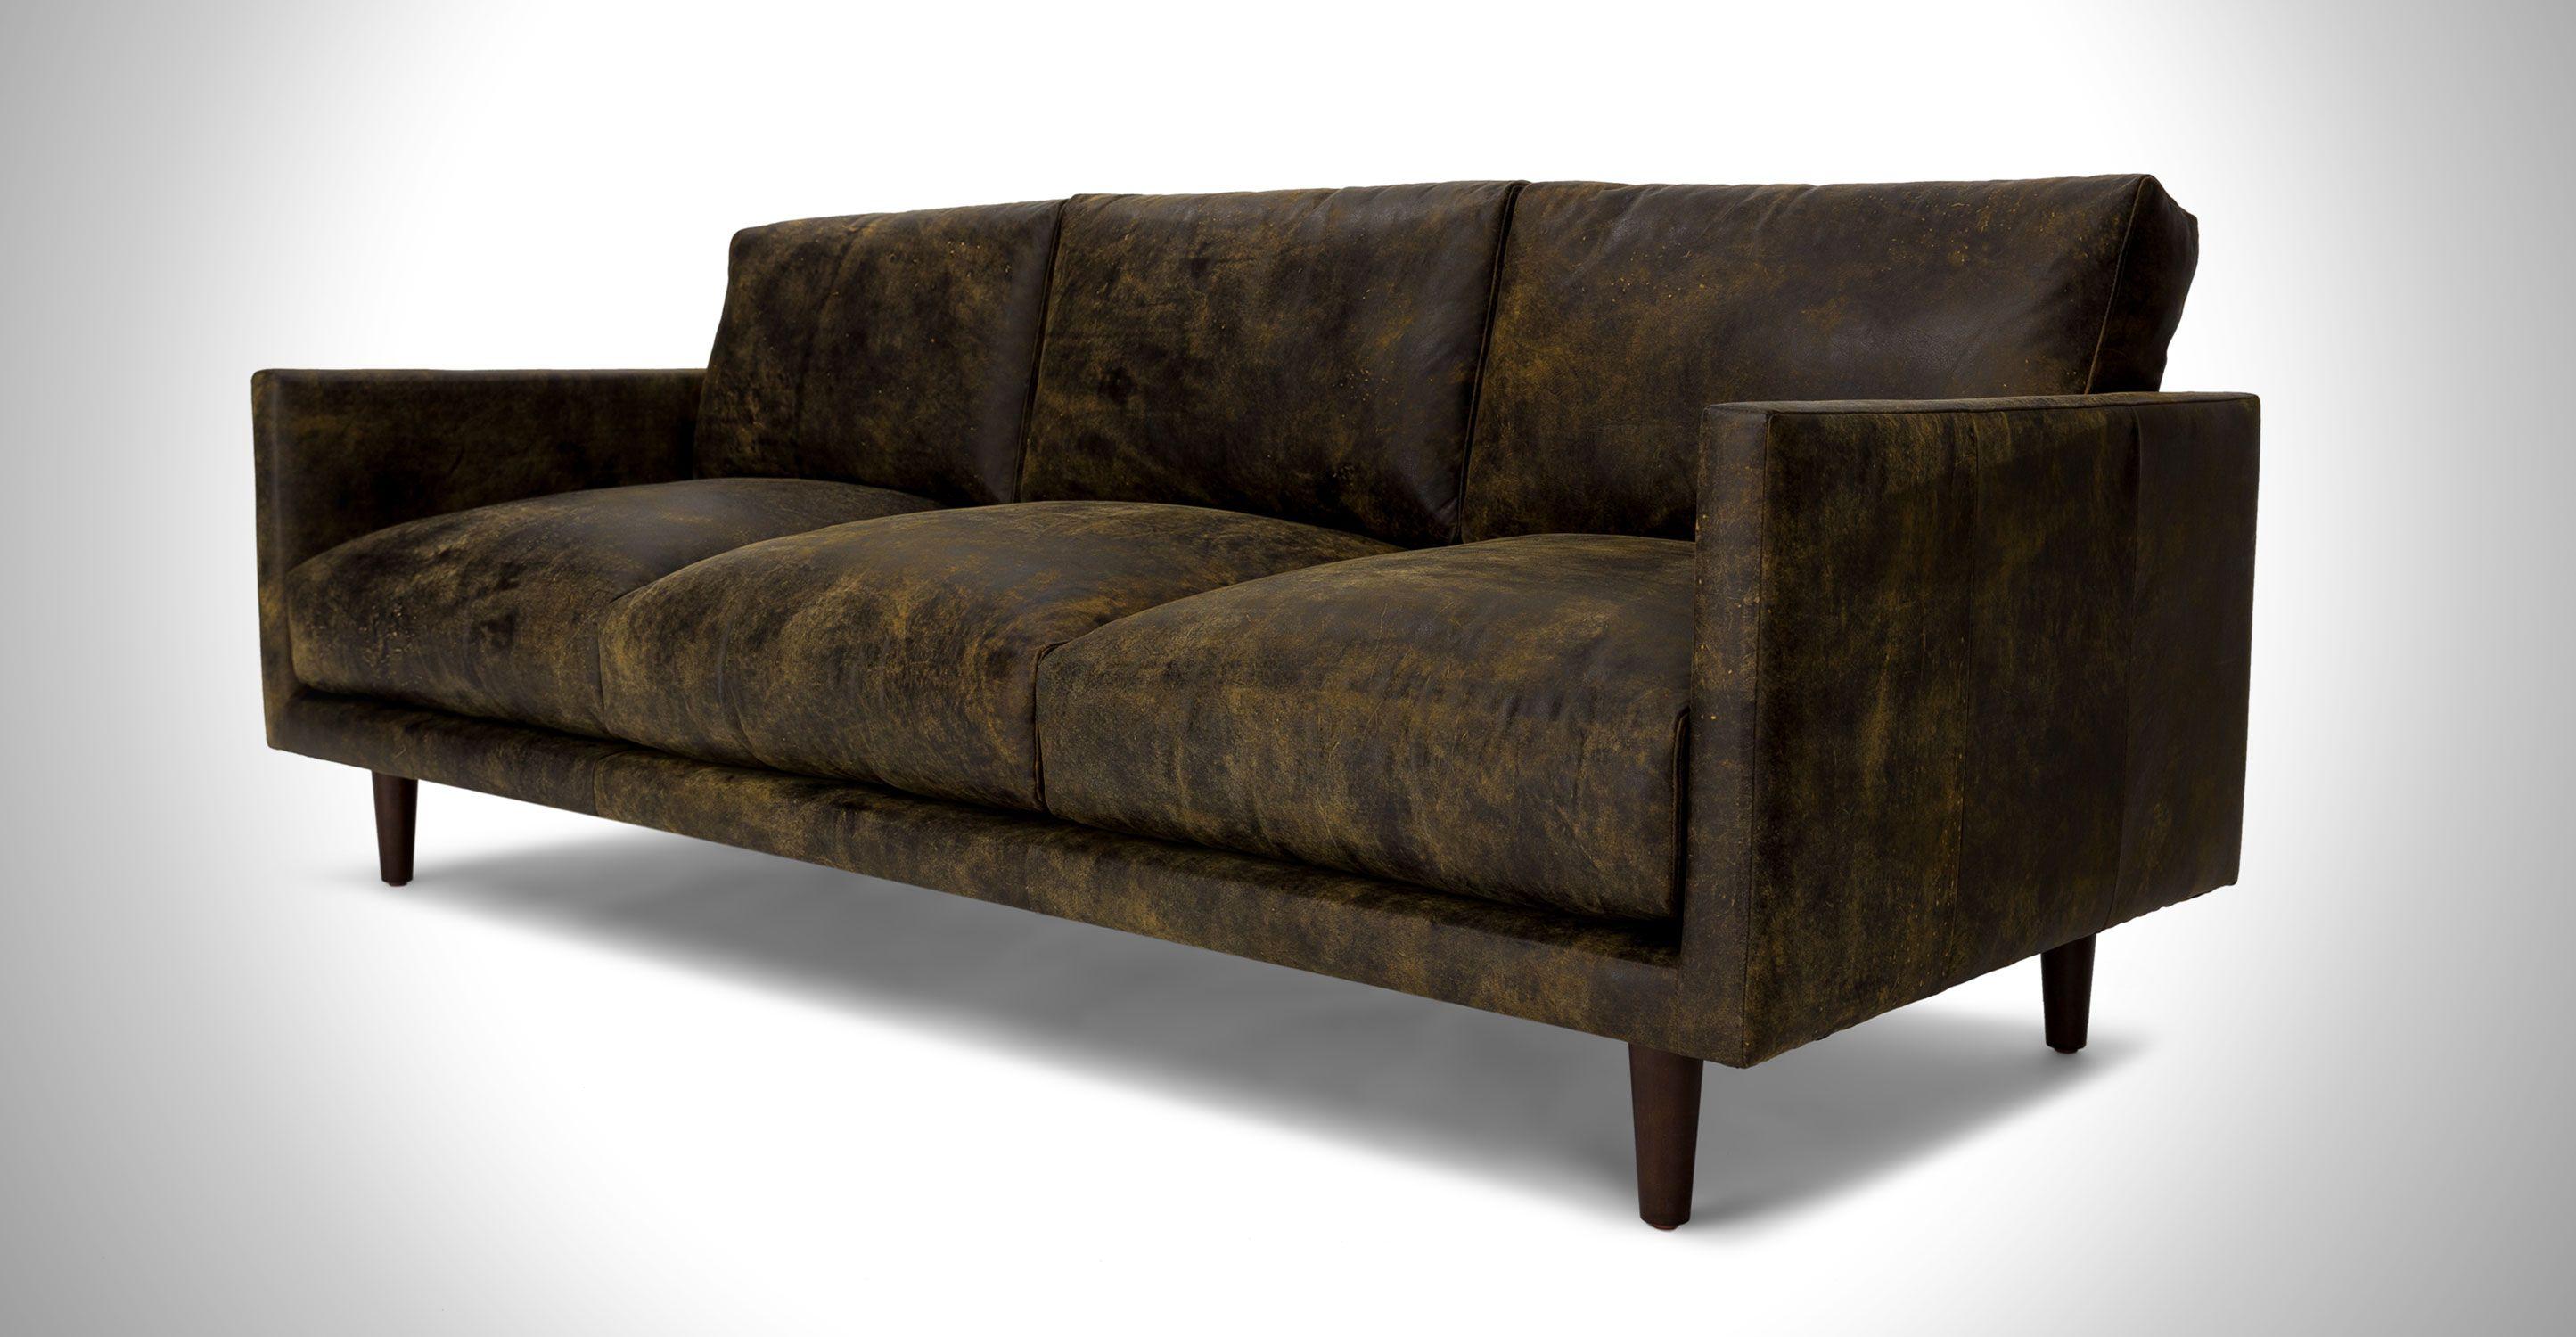 Delightful Dark Brown Leather Sofa   Upholstered   Article Nirvana Modern Furniture